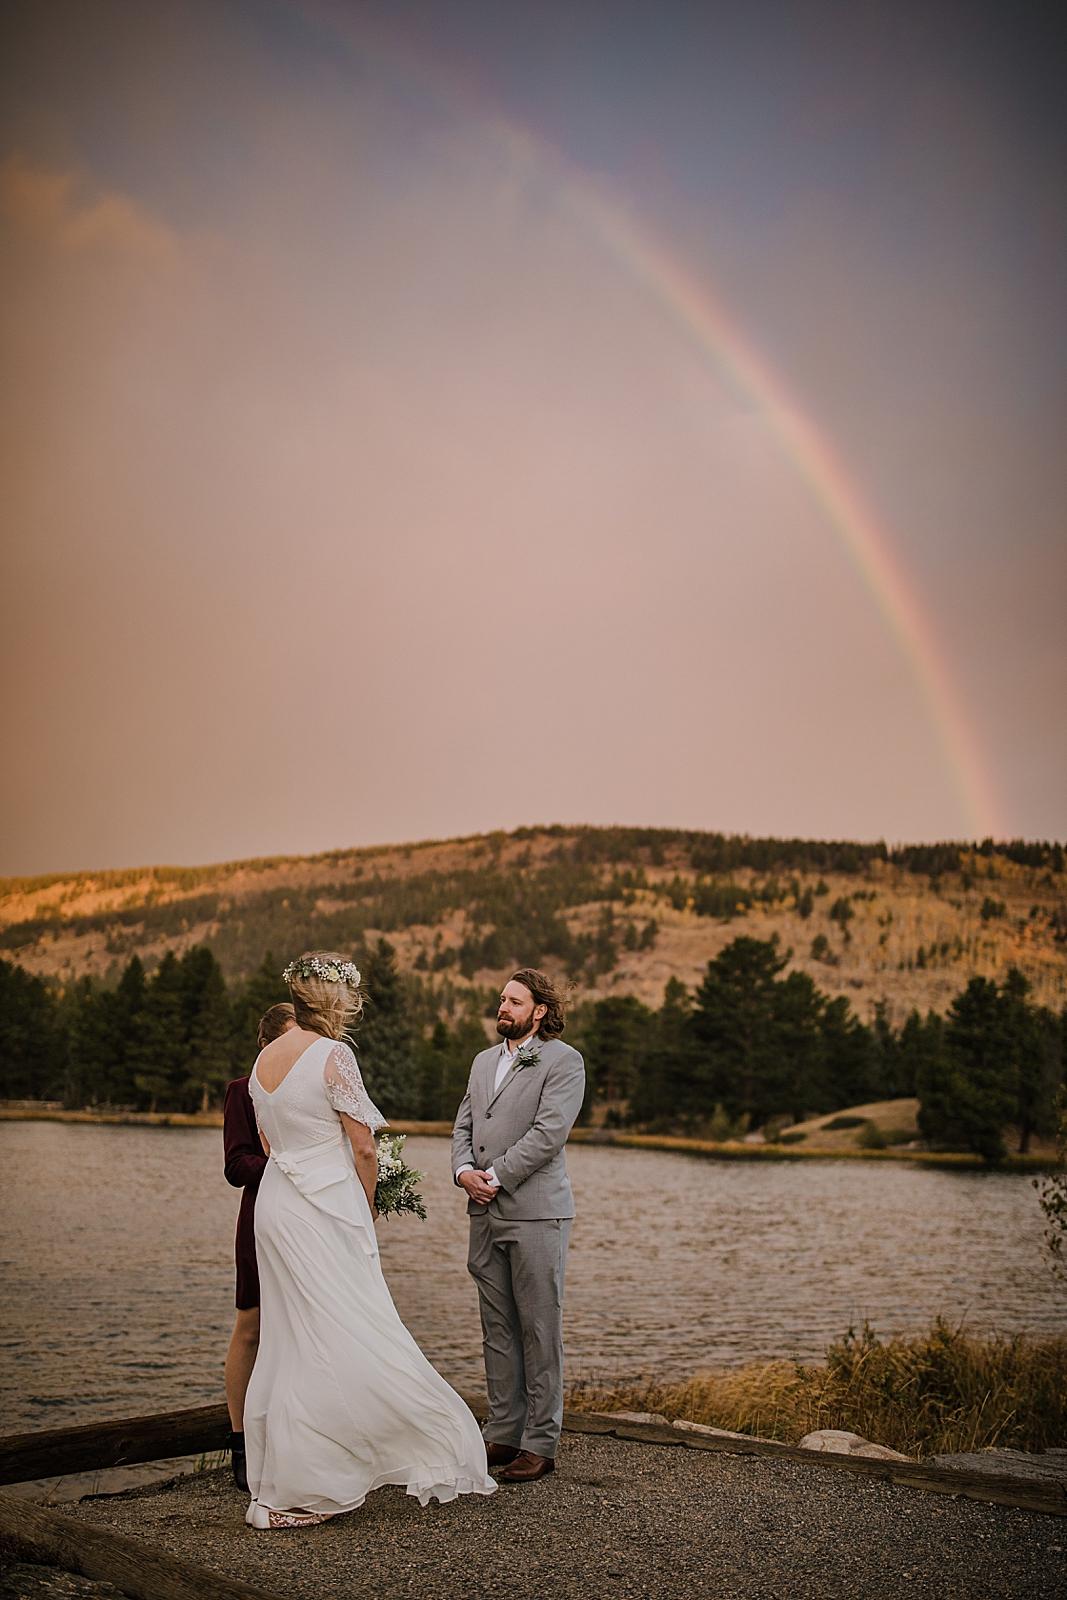 sprague lake dock elopement ceremony, sunrise elopement, colorado elopement, sprague lake elopement, rainbow elopement, rocky mountain national park elopement, adventurous colorado hiking elopement